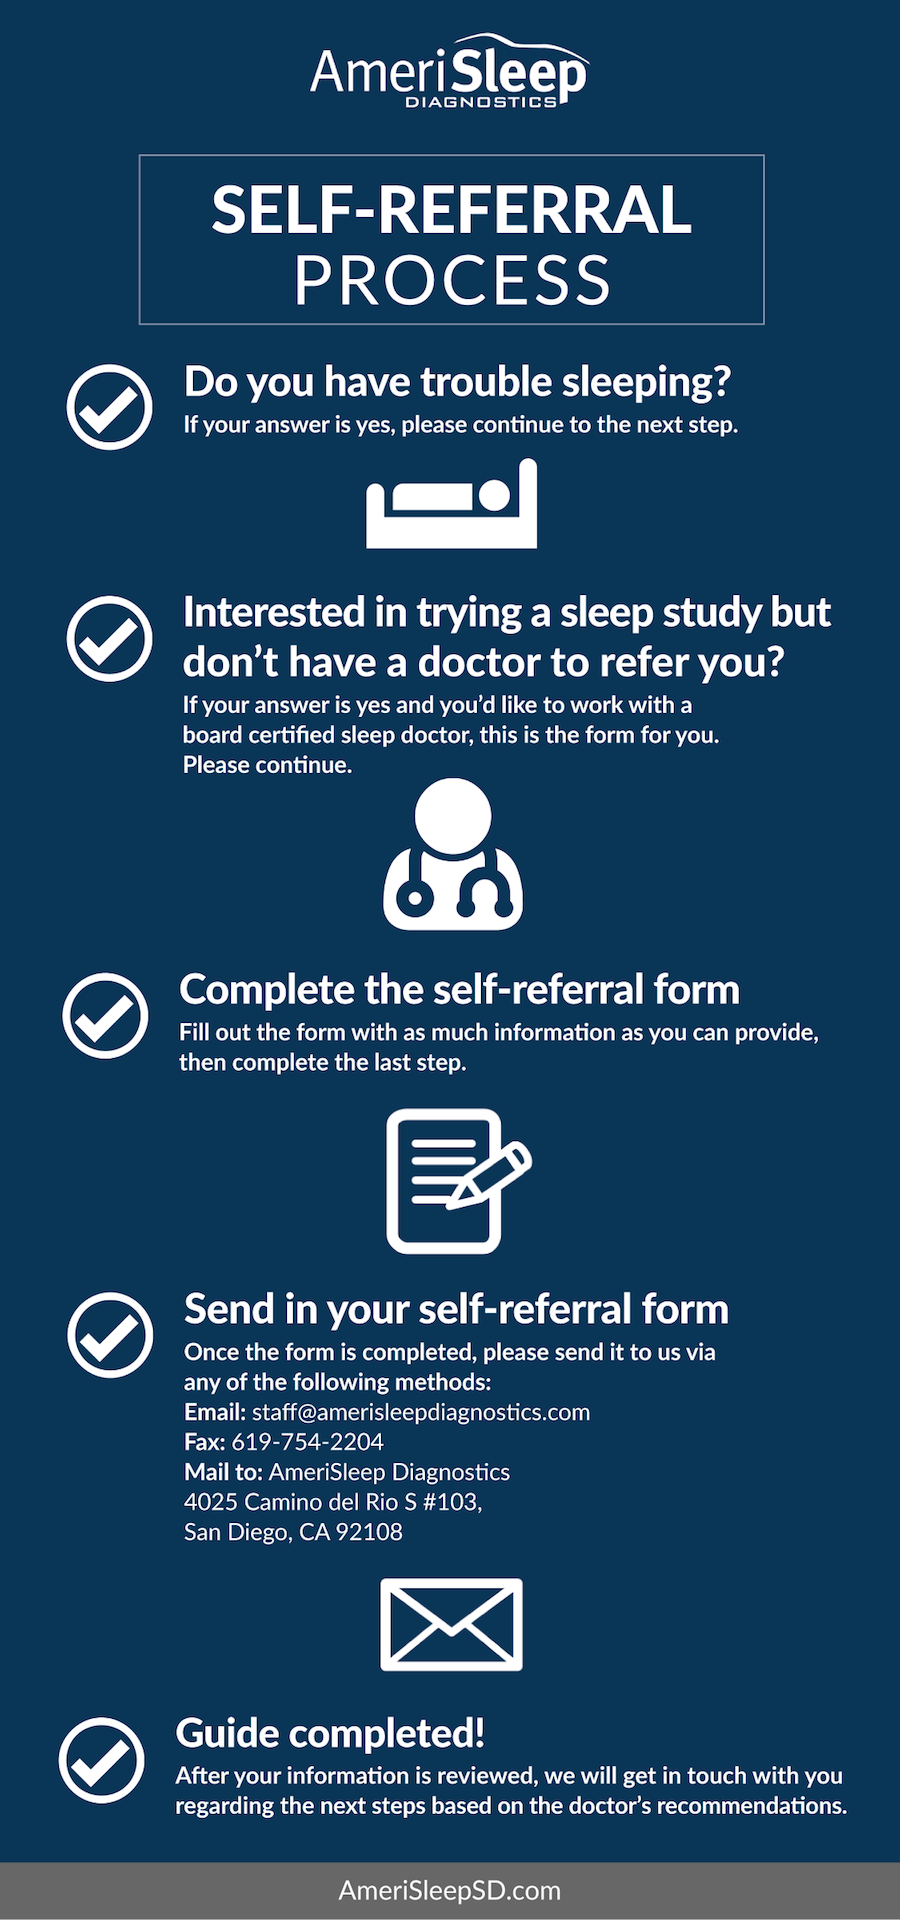 sleep-testing-study-apnea-snoring-amerisleep-osa-cpap-bipap-asv-narcolepsy-sleepmed-polysomnography-treatment-diagnostics